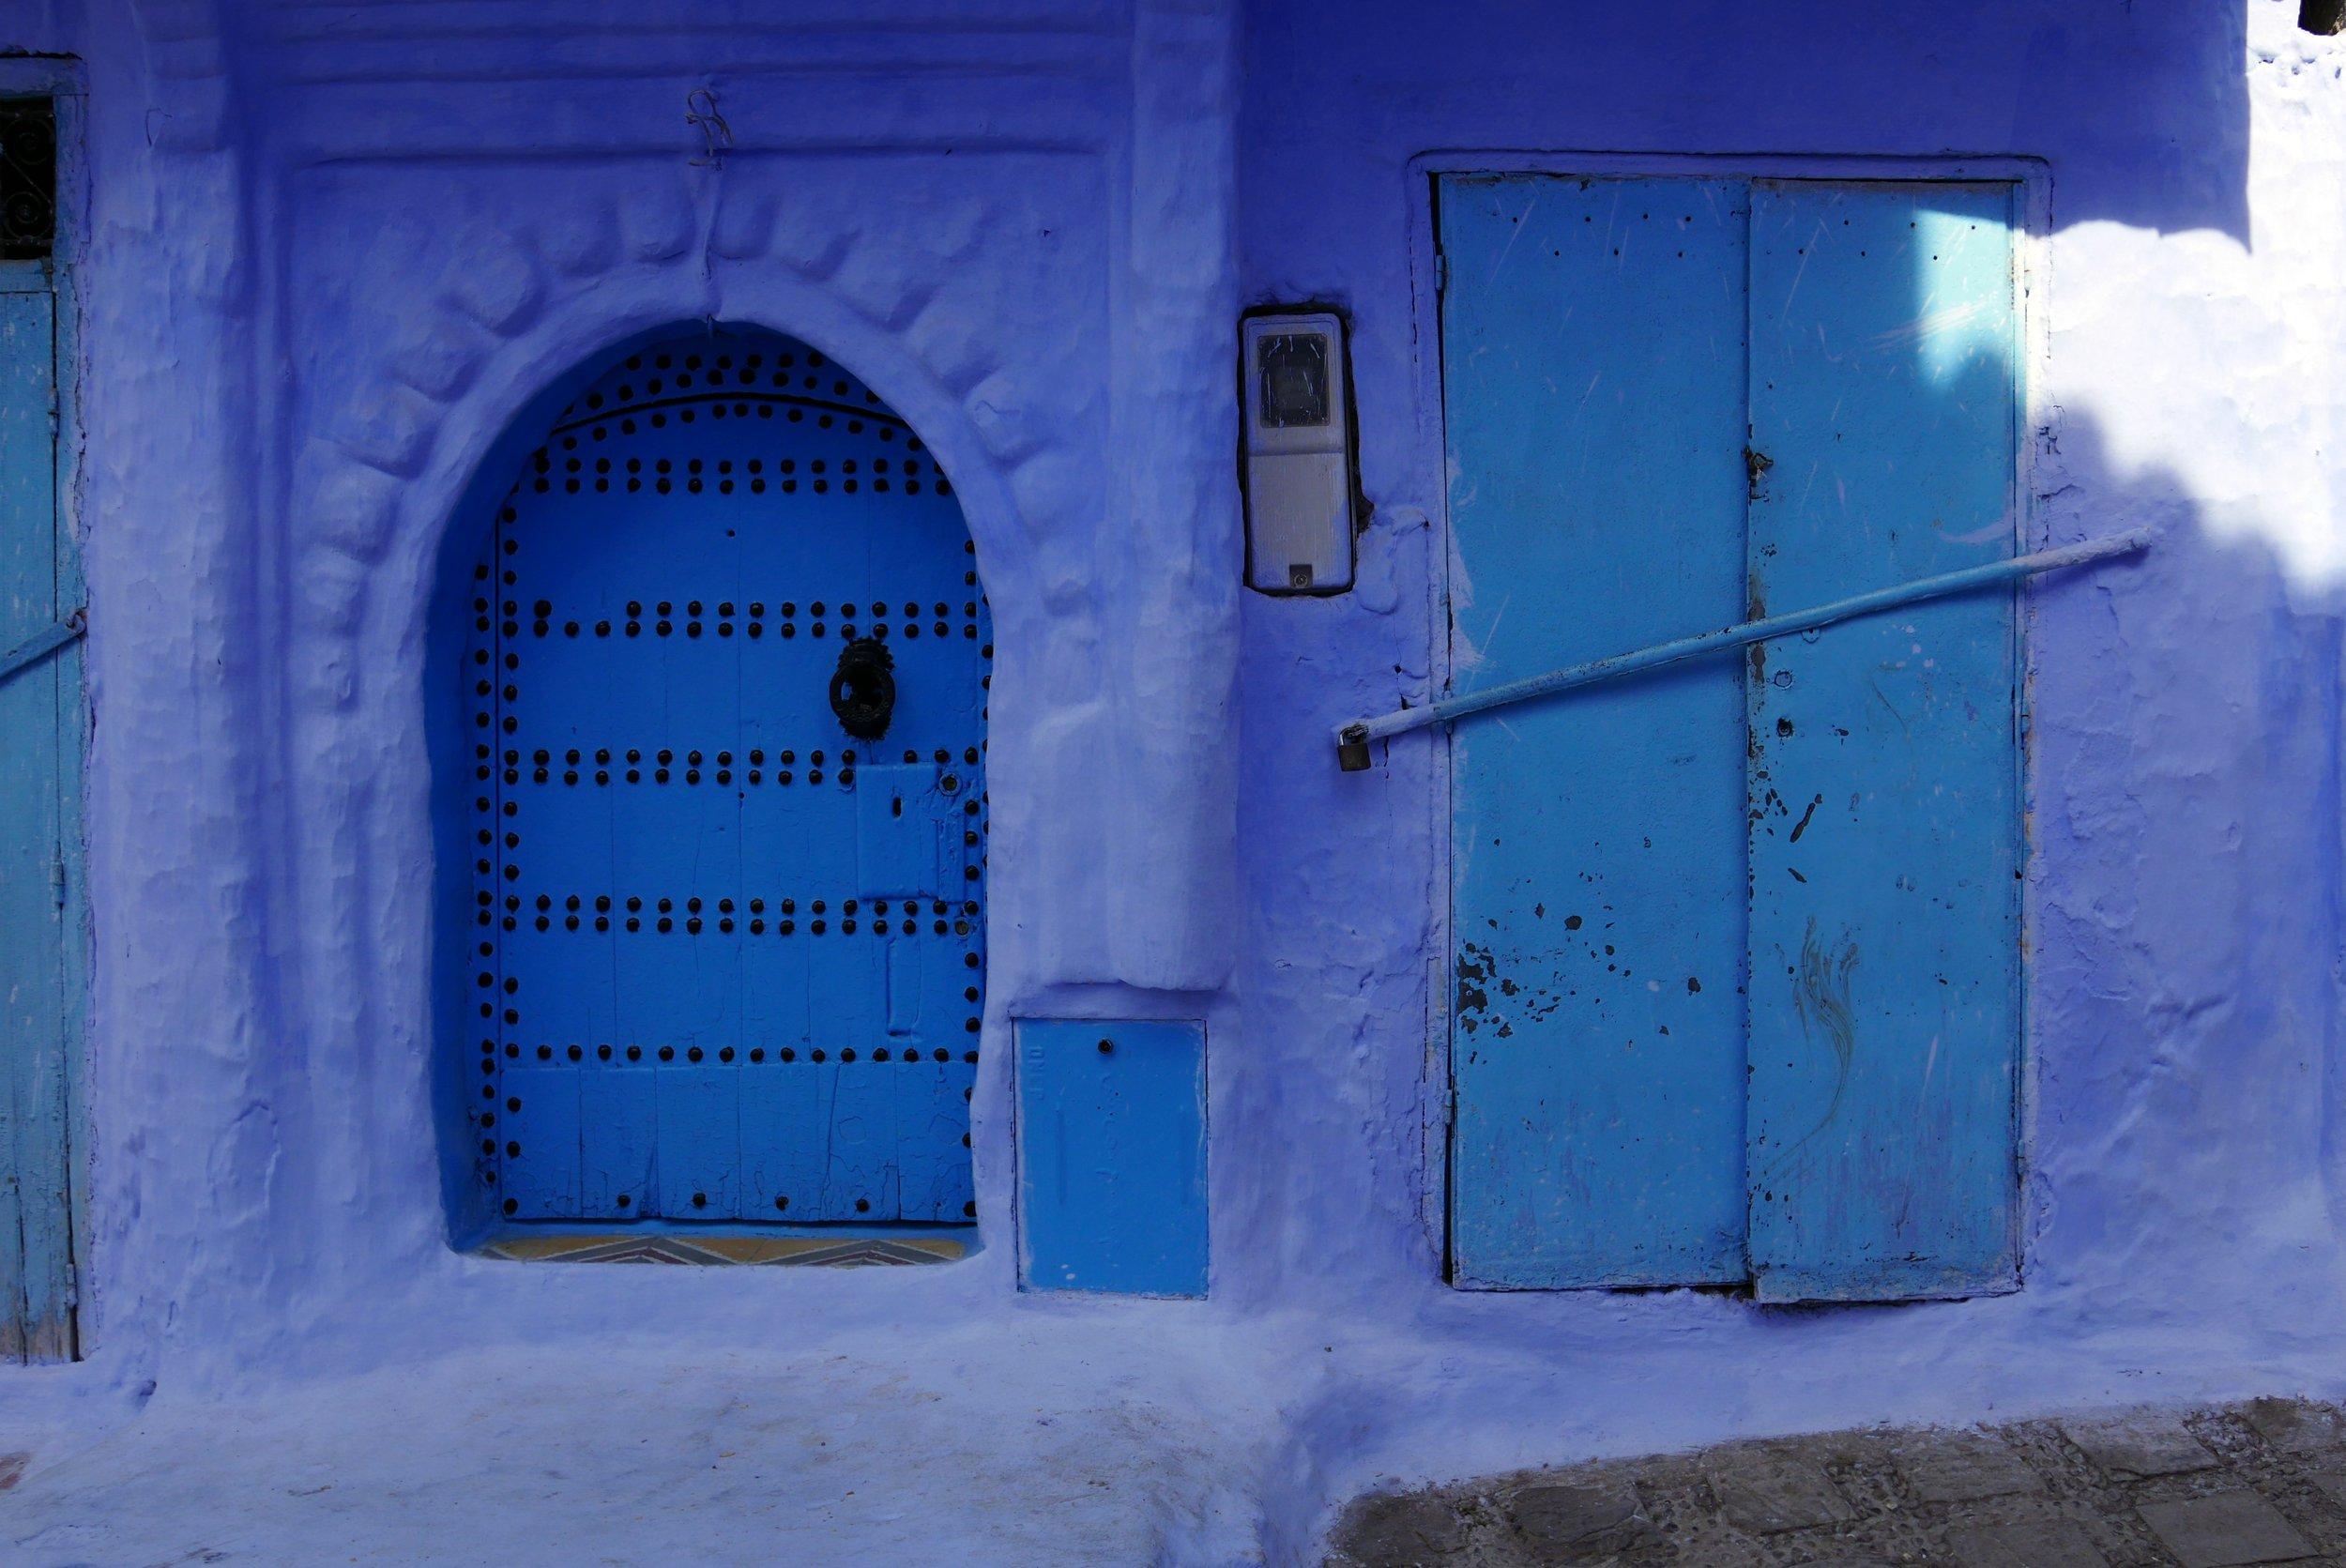 morocco-3735564.jpg